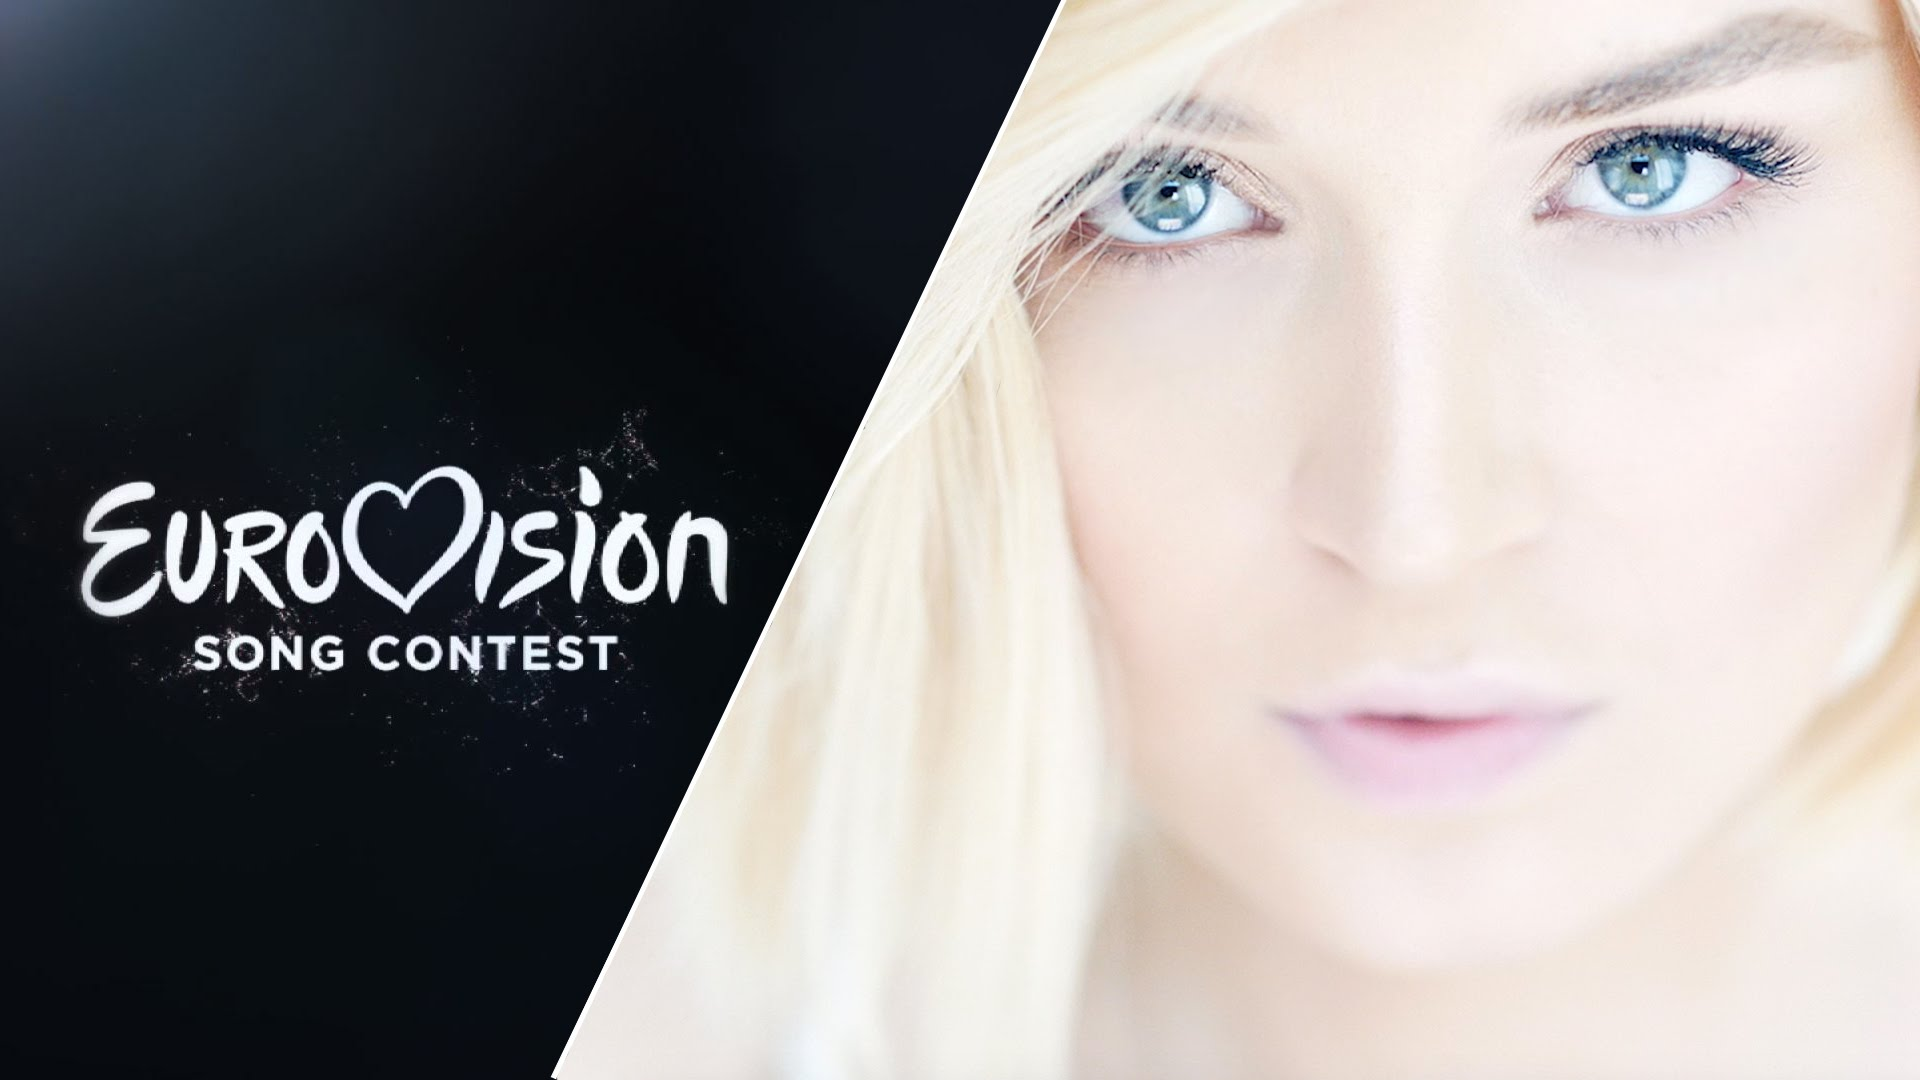 Евровидение 2015 Полина Гагарина клип- Polina Gagarina - A Million Voices (Russia) 2015 Eurovision S